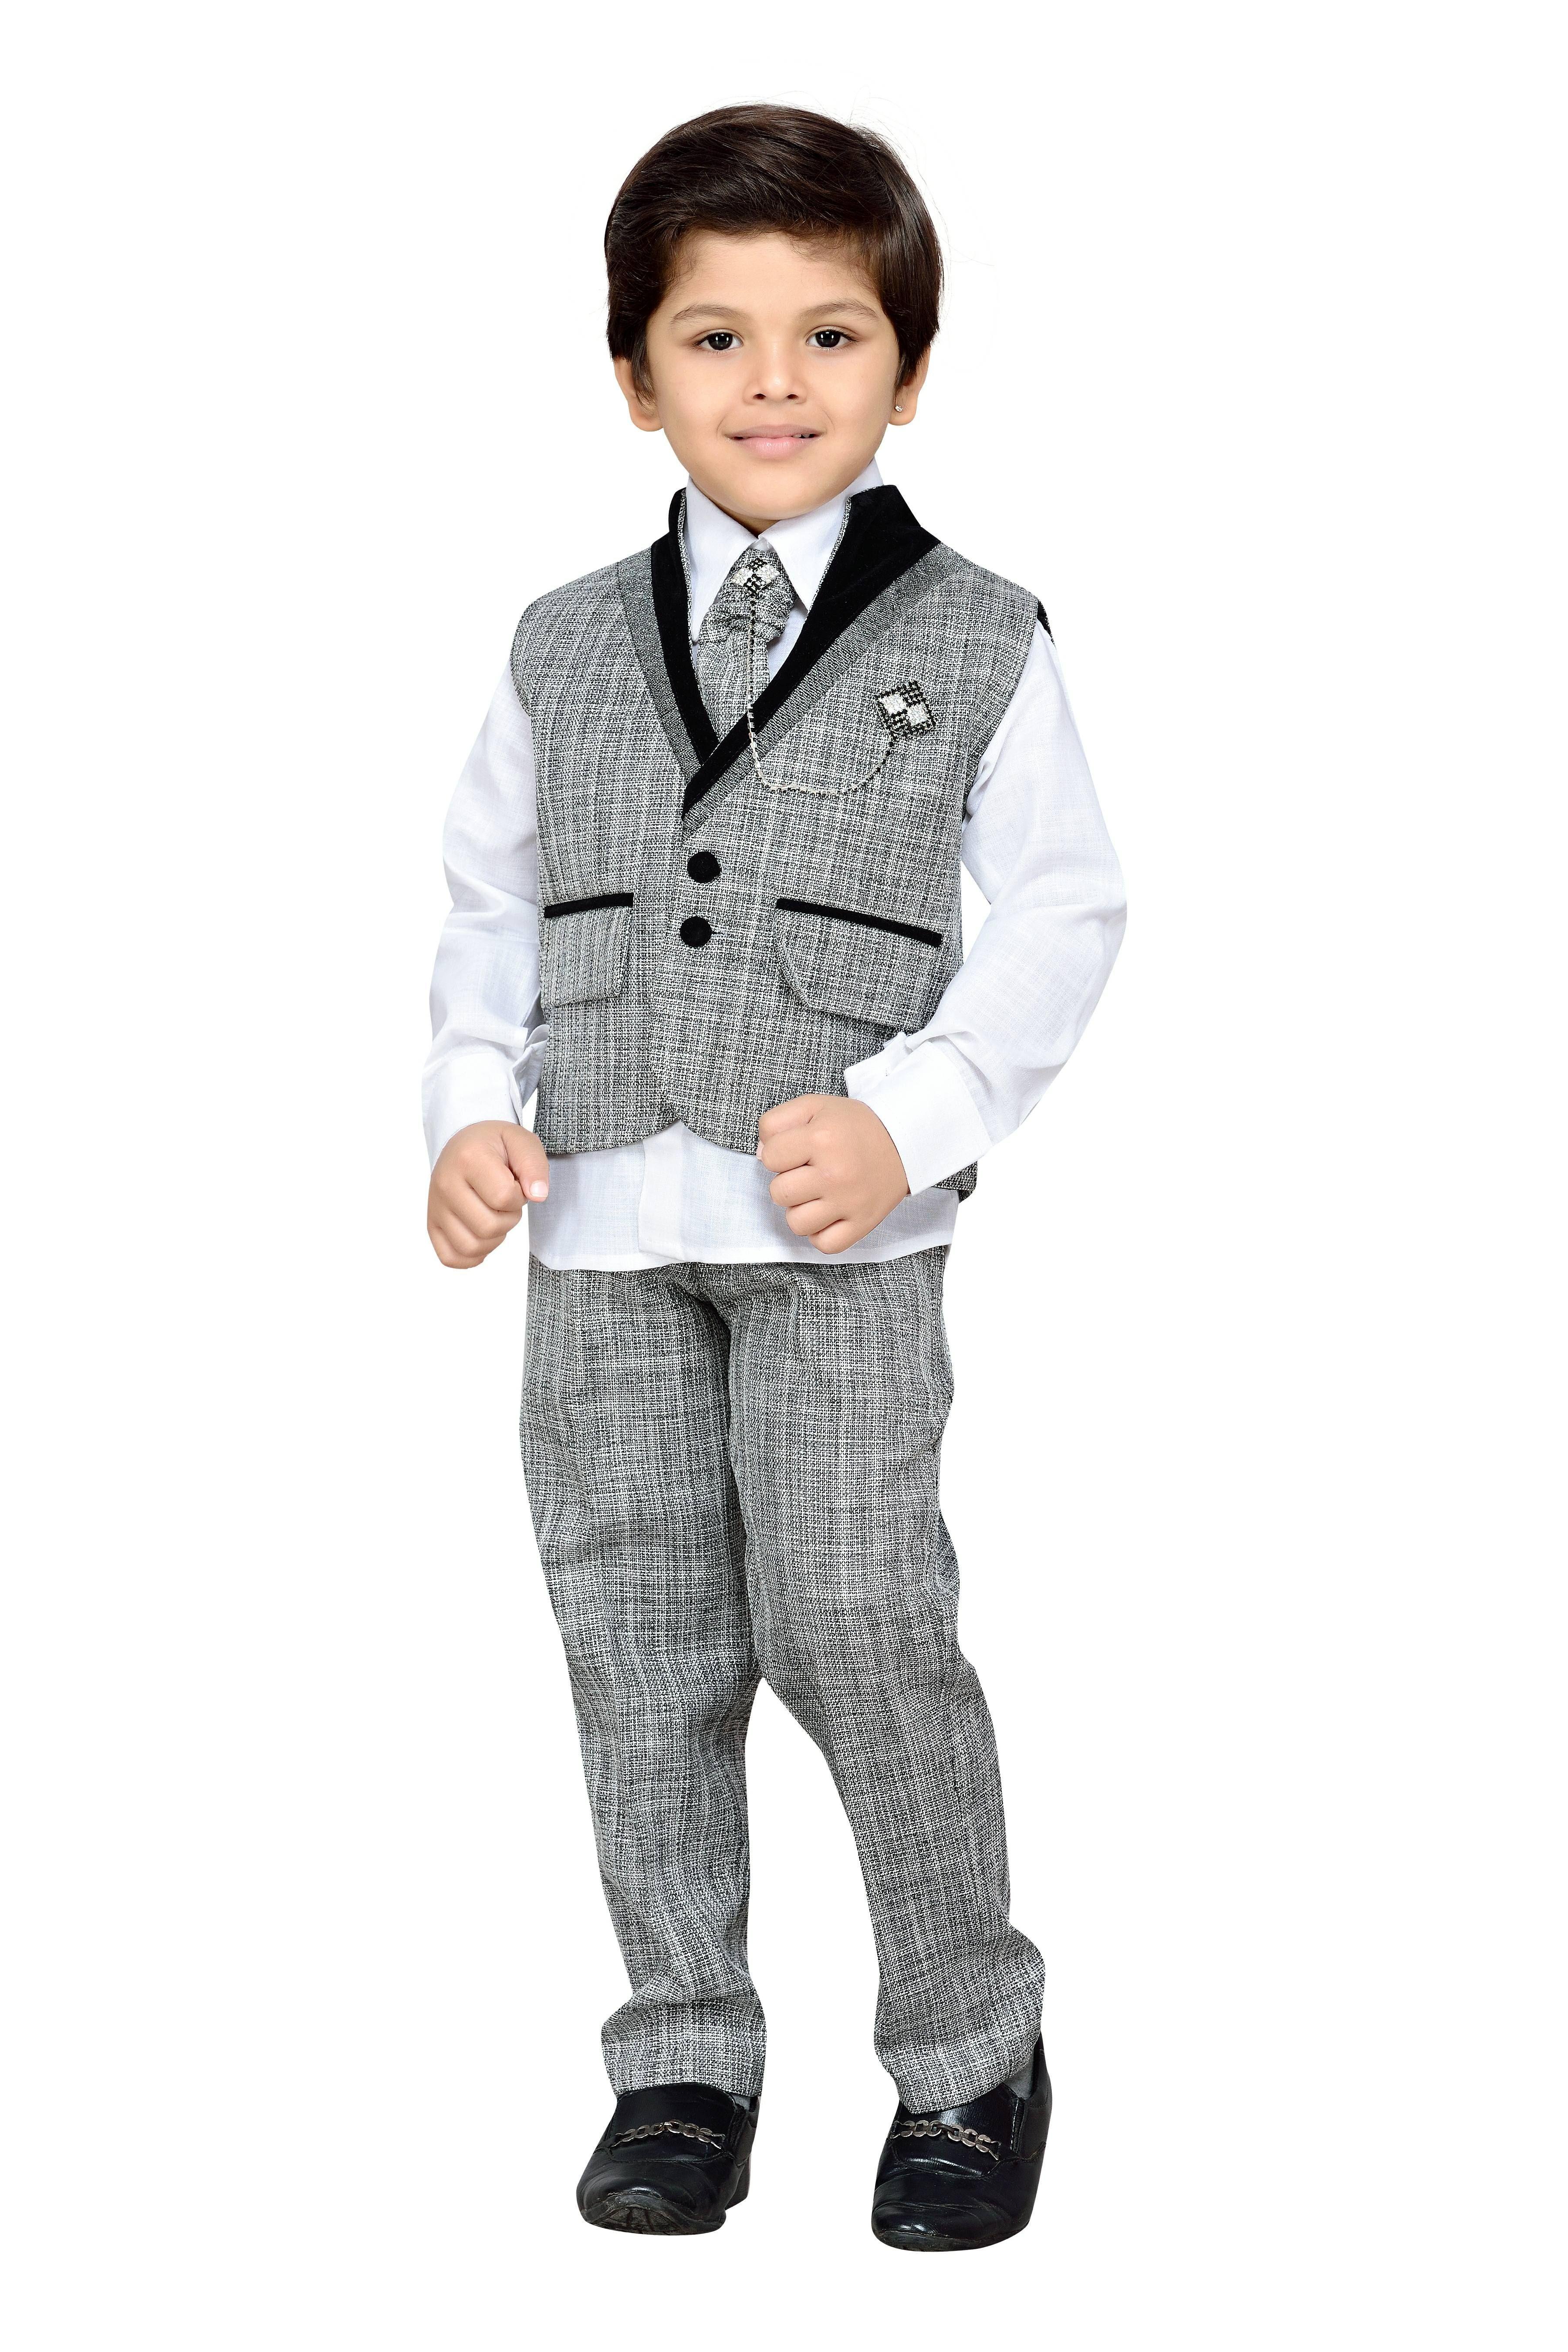 90d01cd08fd 52 Little Boy Outfits To Make Your Boy Look Fashionable  Kids     BoyLookFashionable  LittleBoyOutfits  Kids